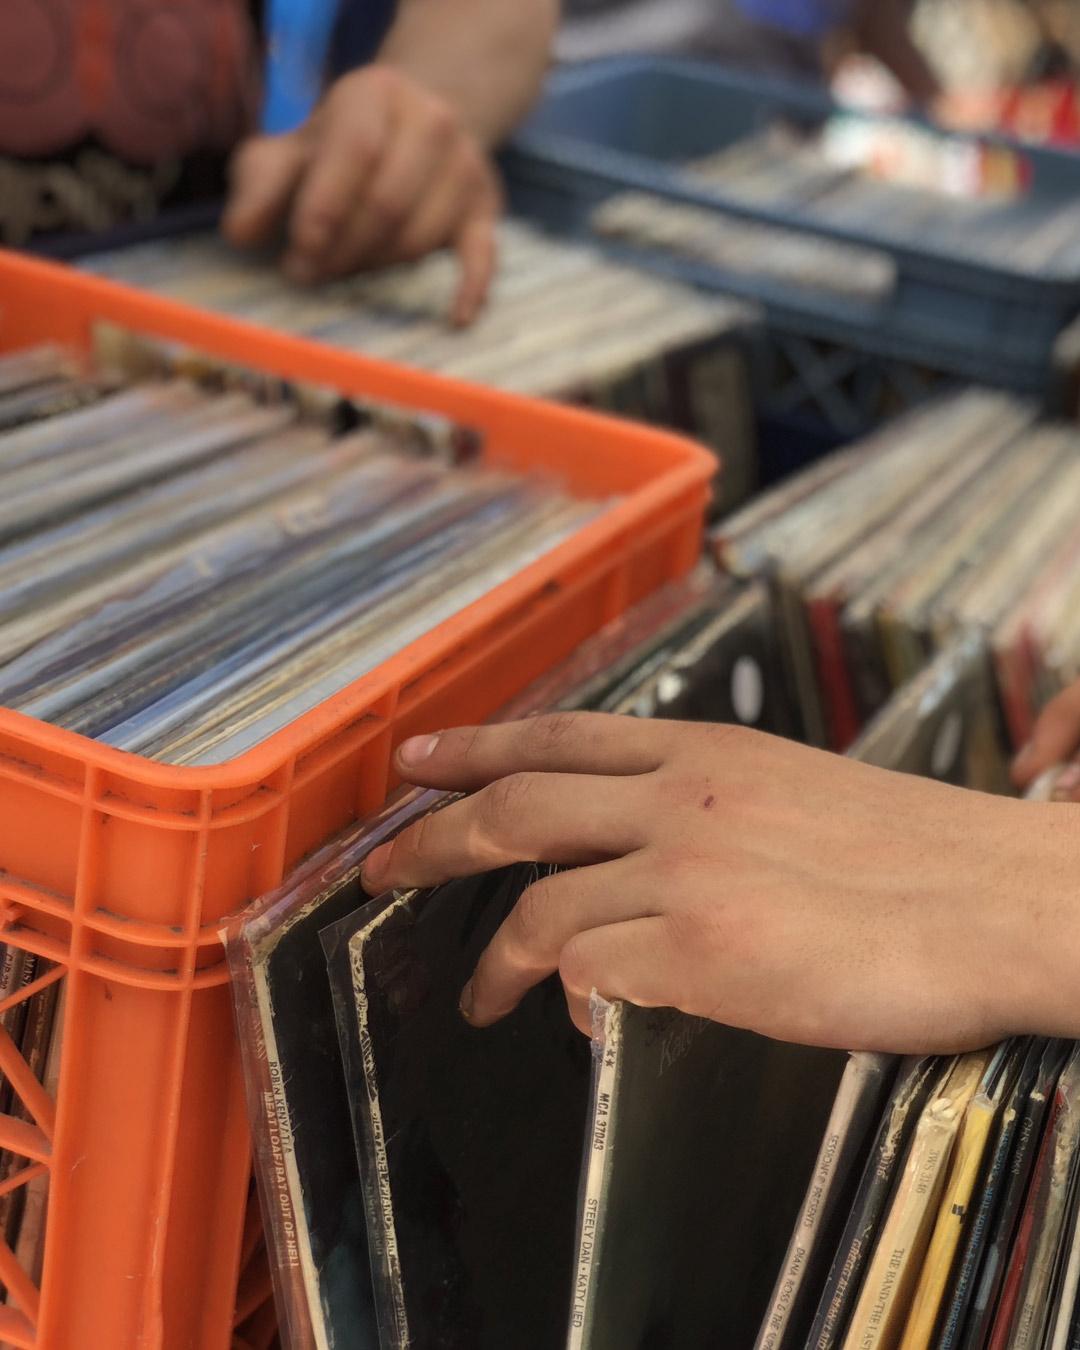 Marketplace Mogul Vendor Selling Records